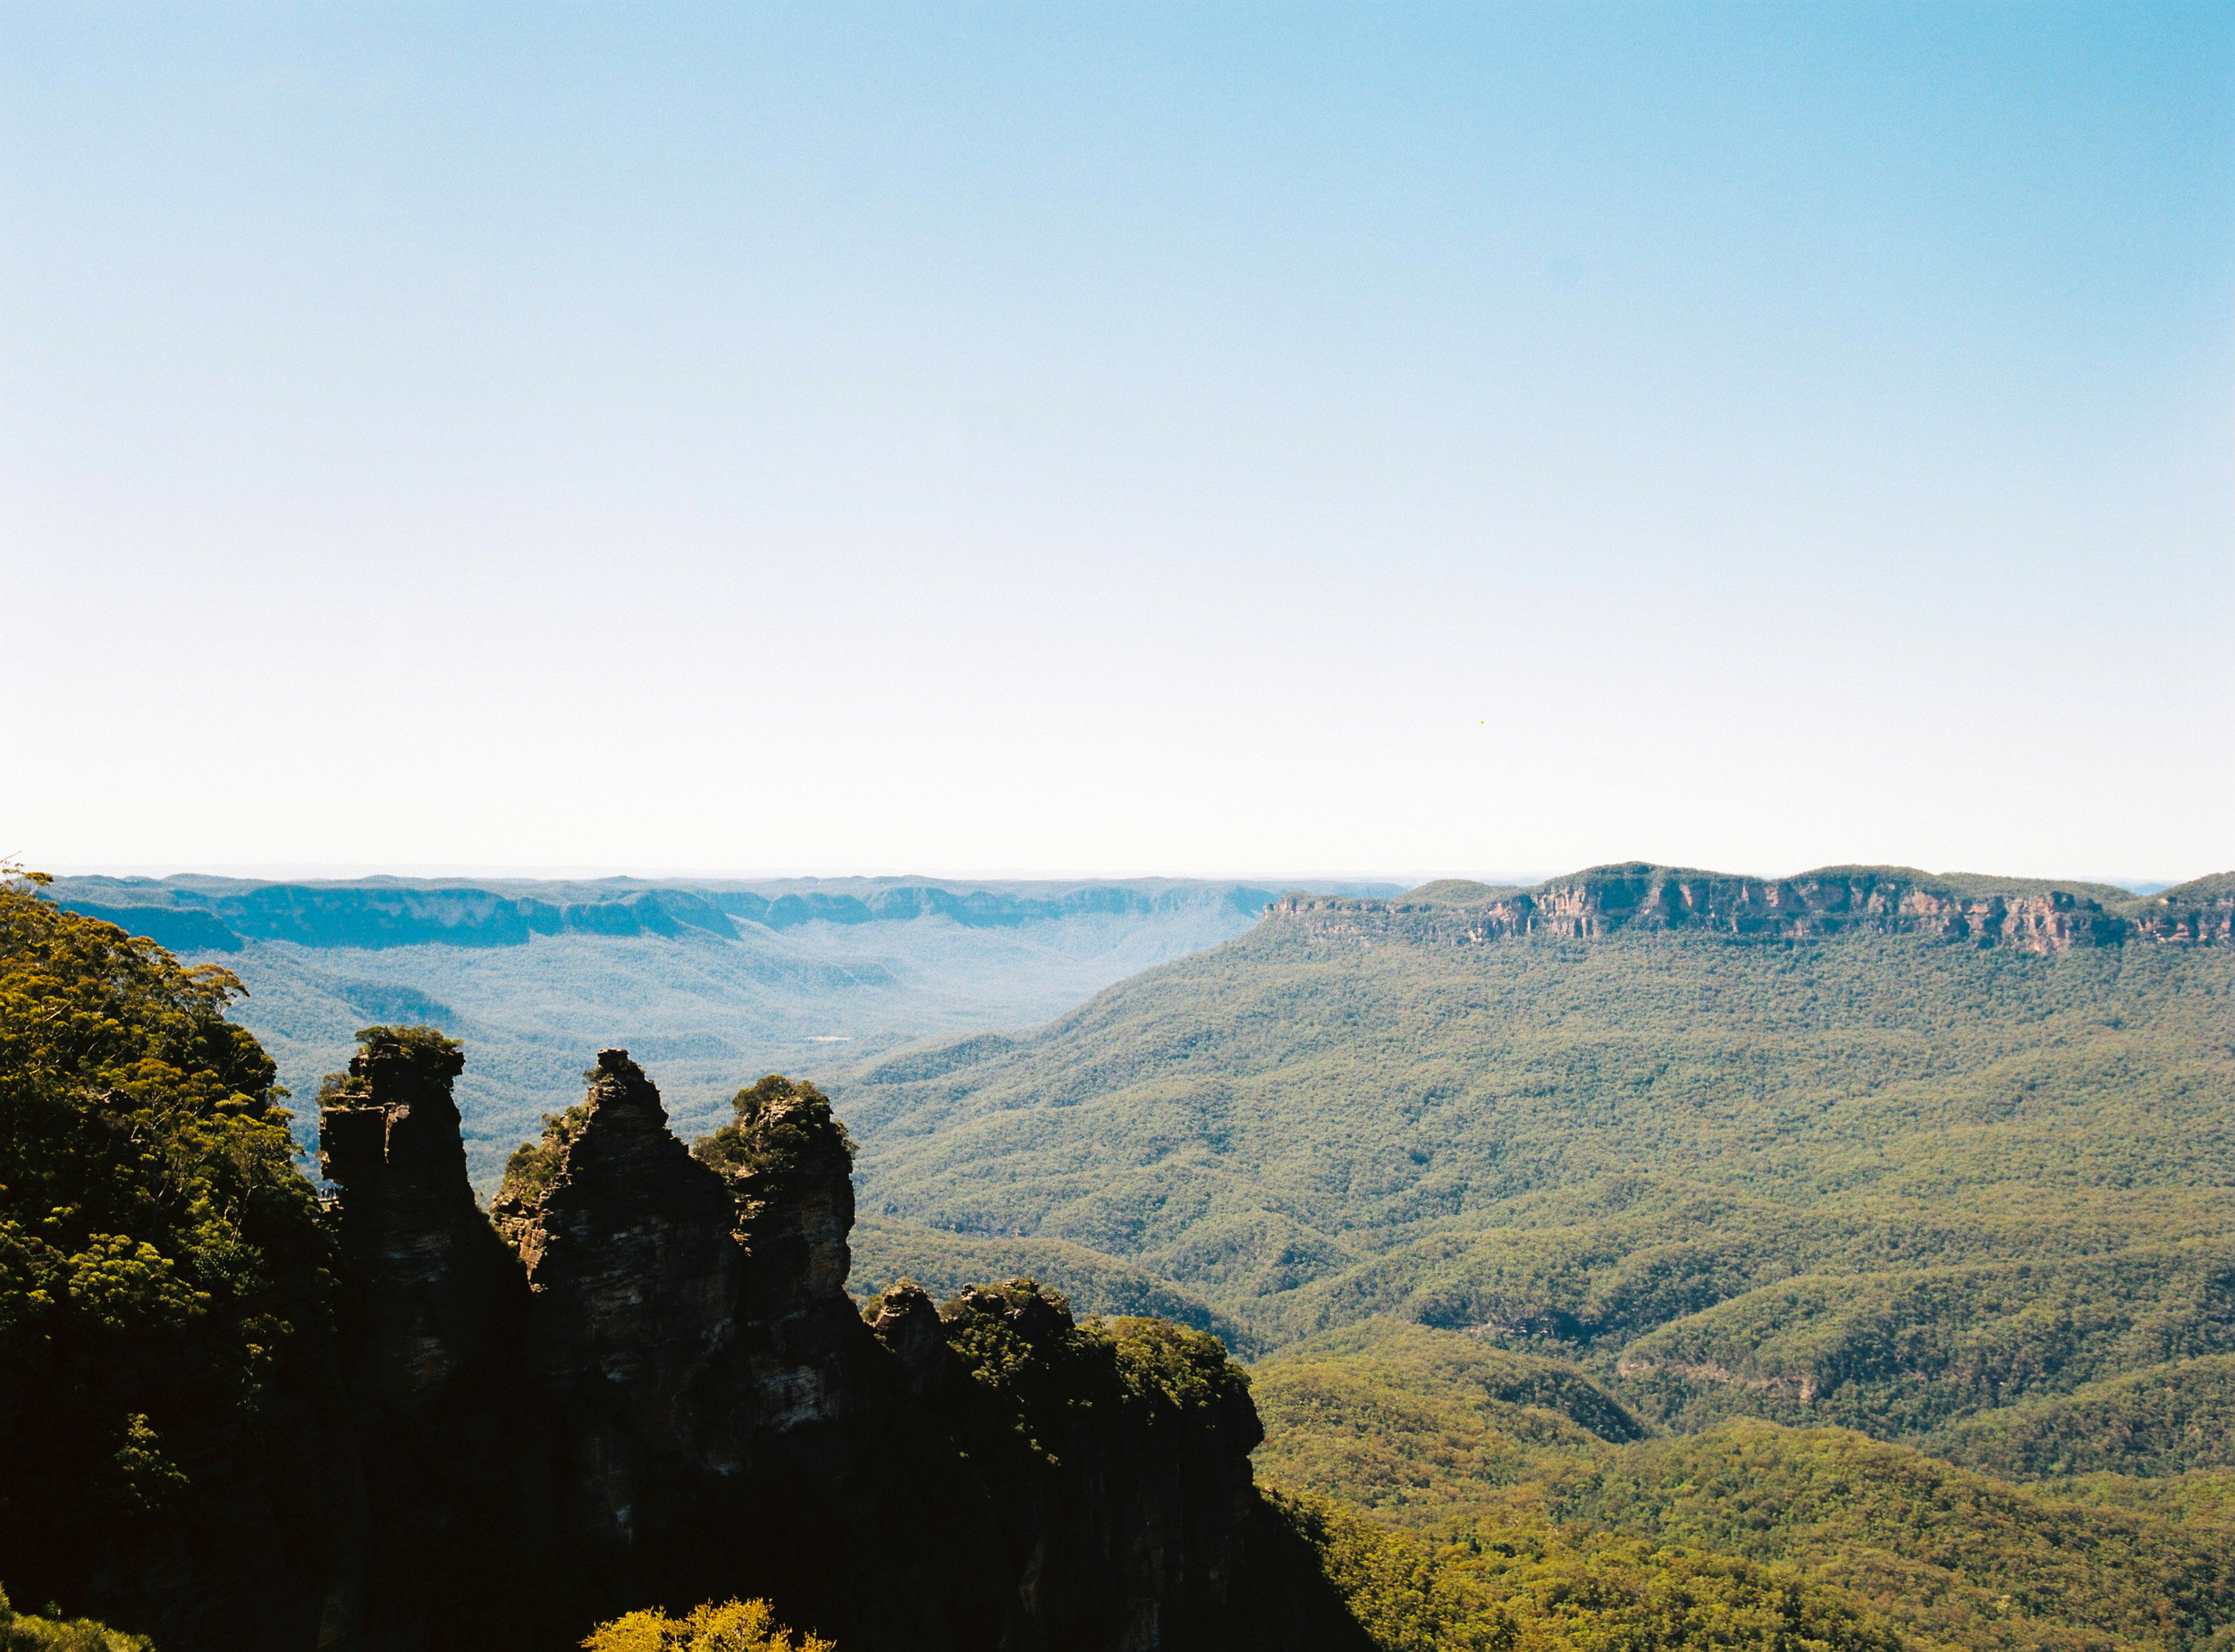 Blue hue on blue mountains in Australia